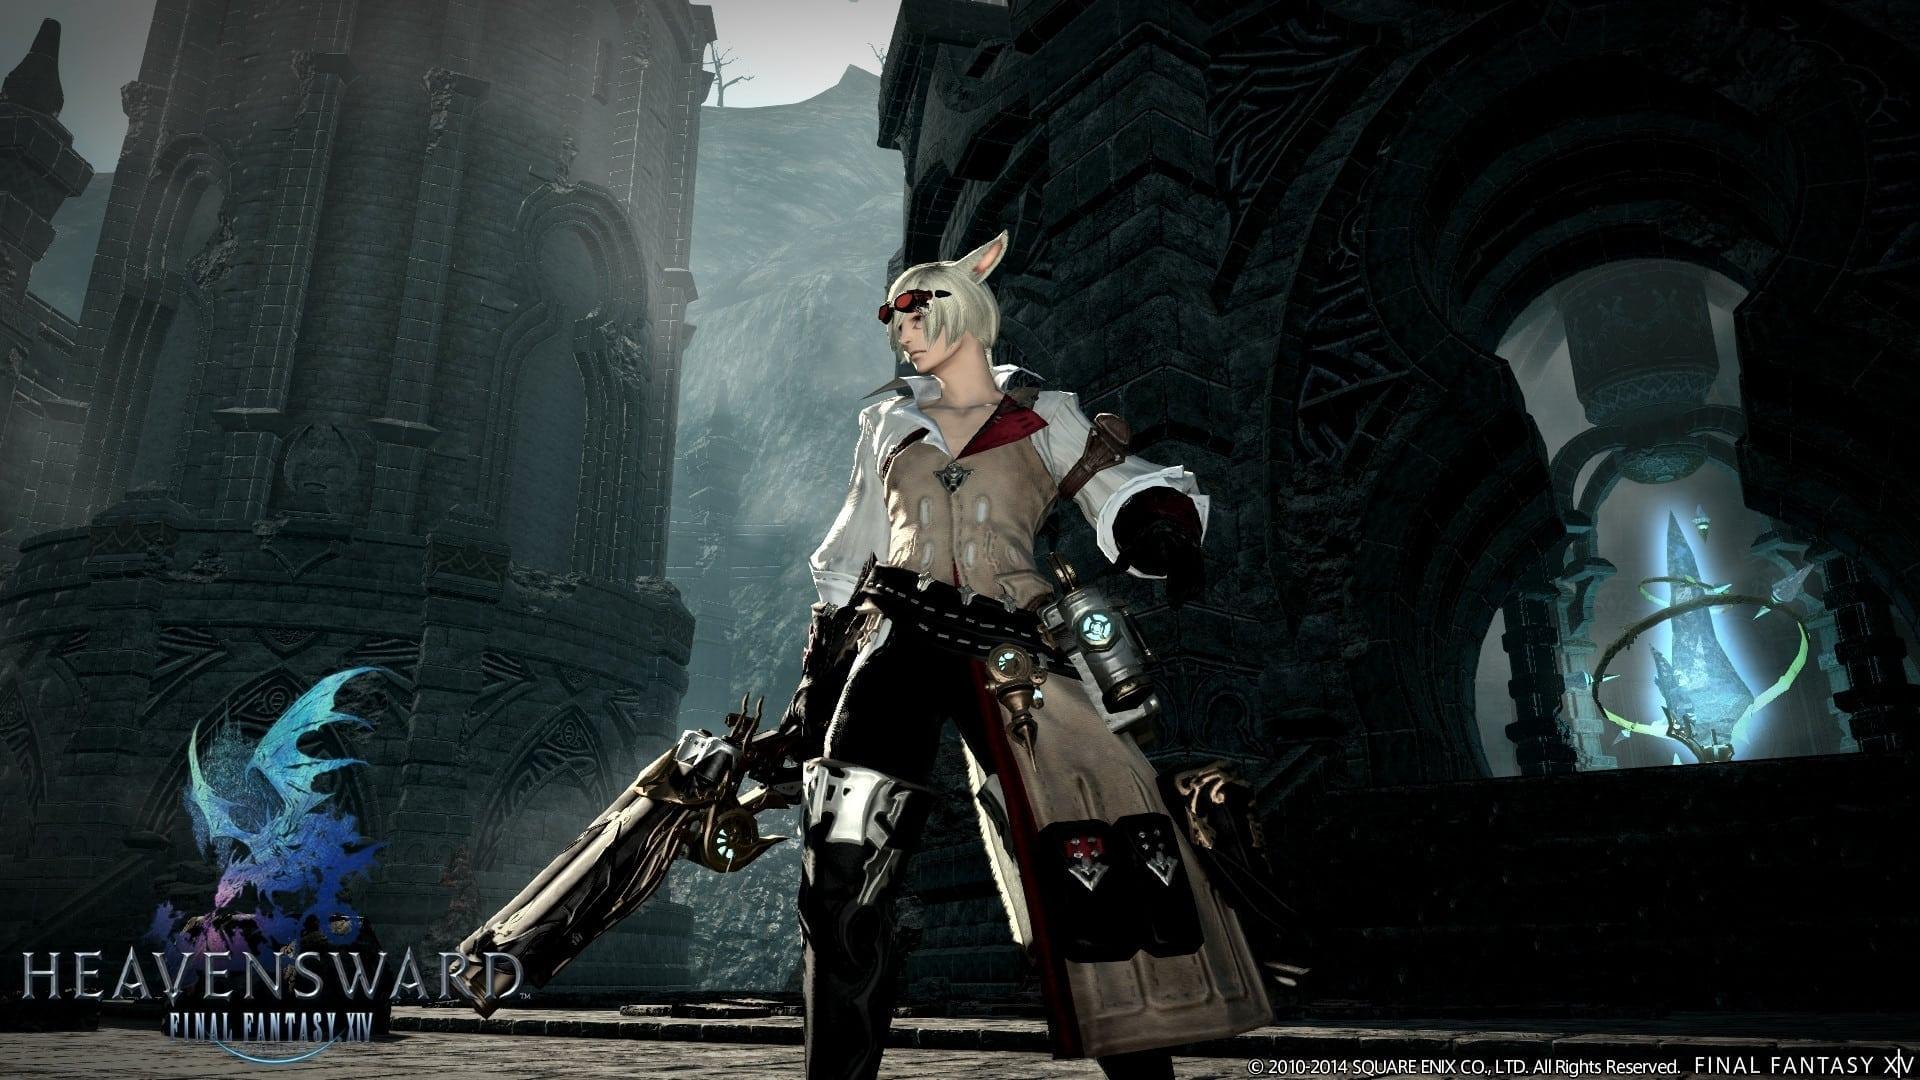 Final Fantasy XIV Heavensward - Machinist image 3